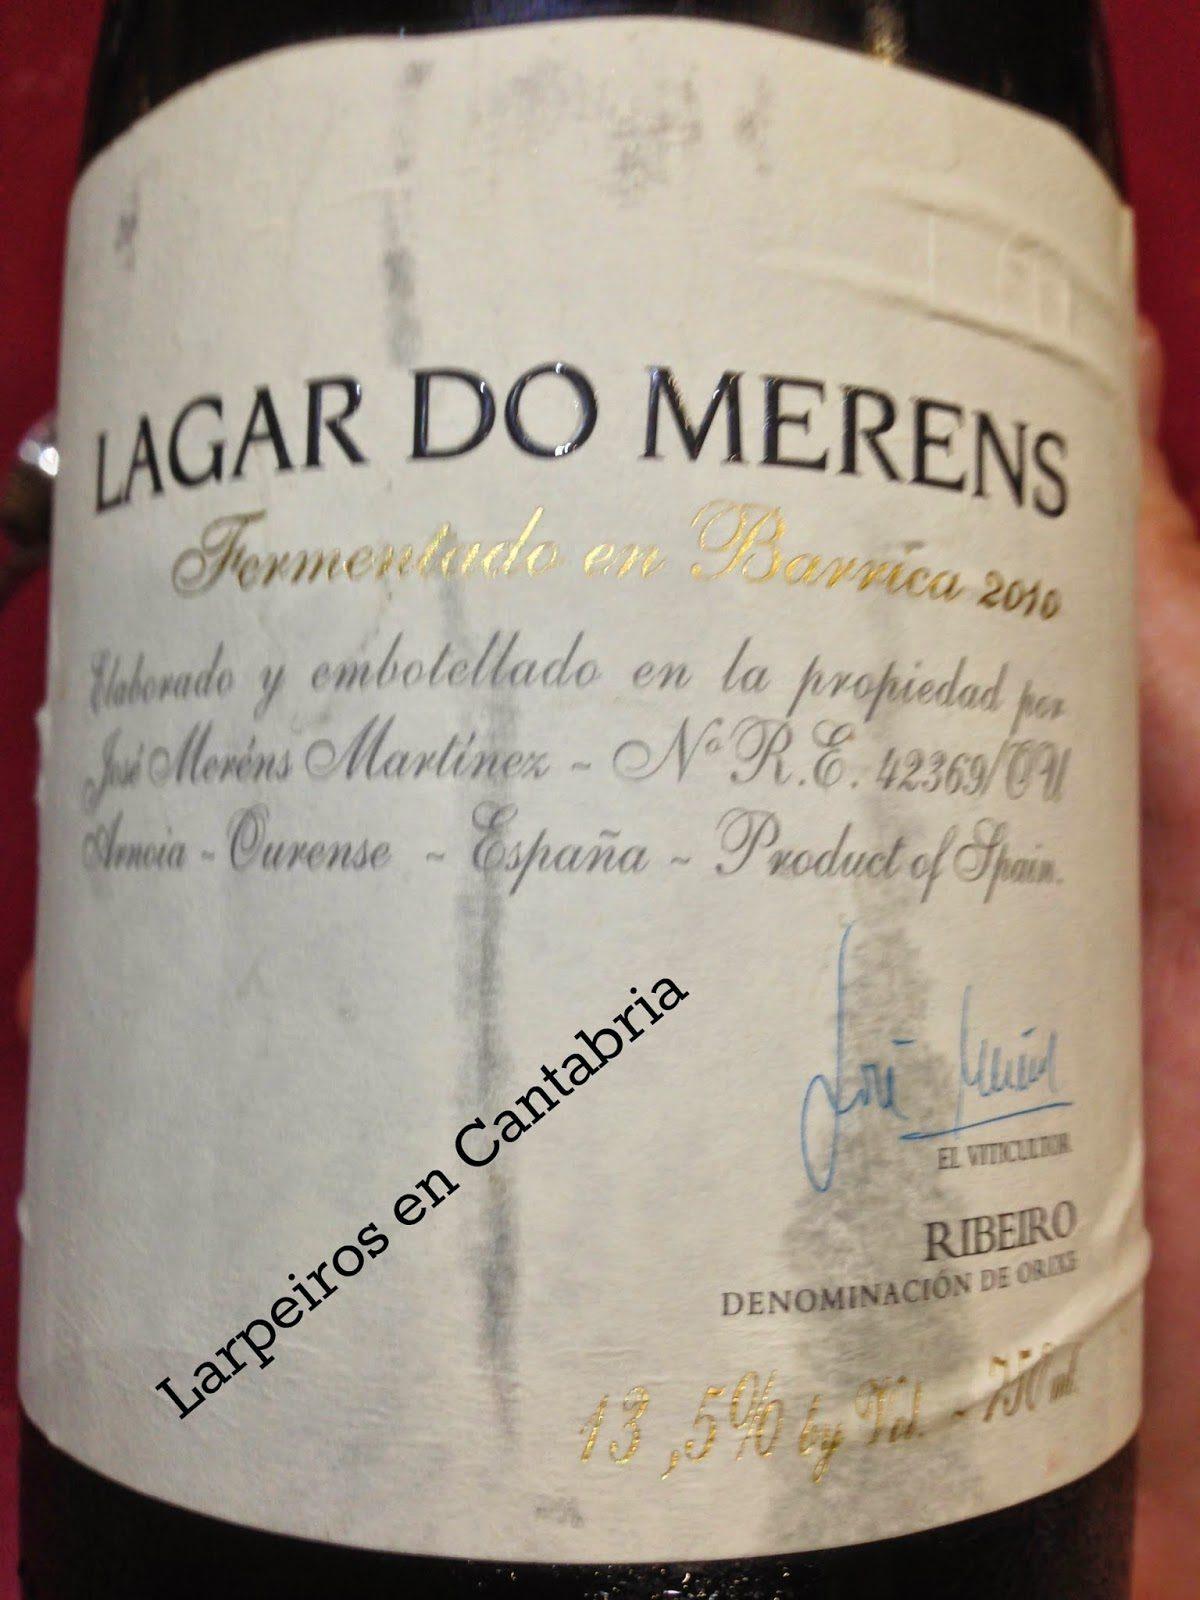 Vino Blanco Lagar do Merens 2010 Fermentado en Barrica: Bien ensamblado